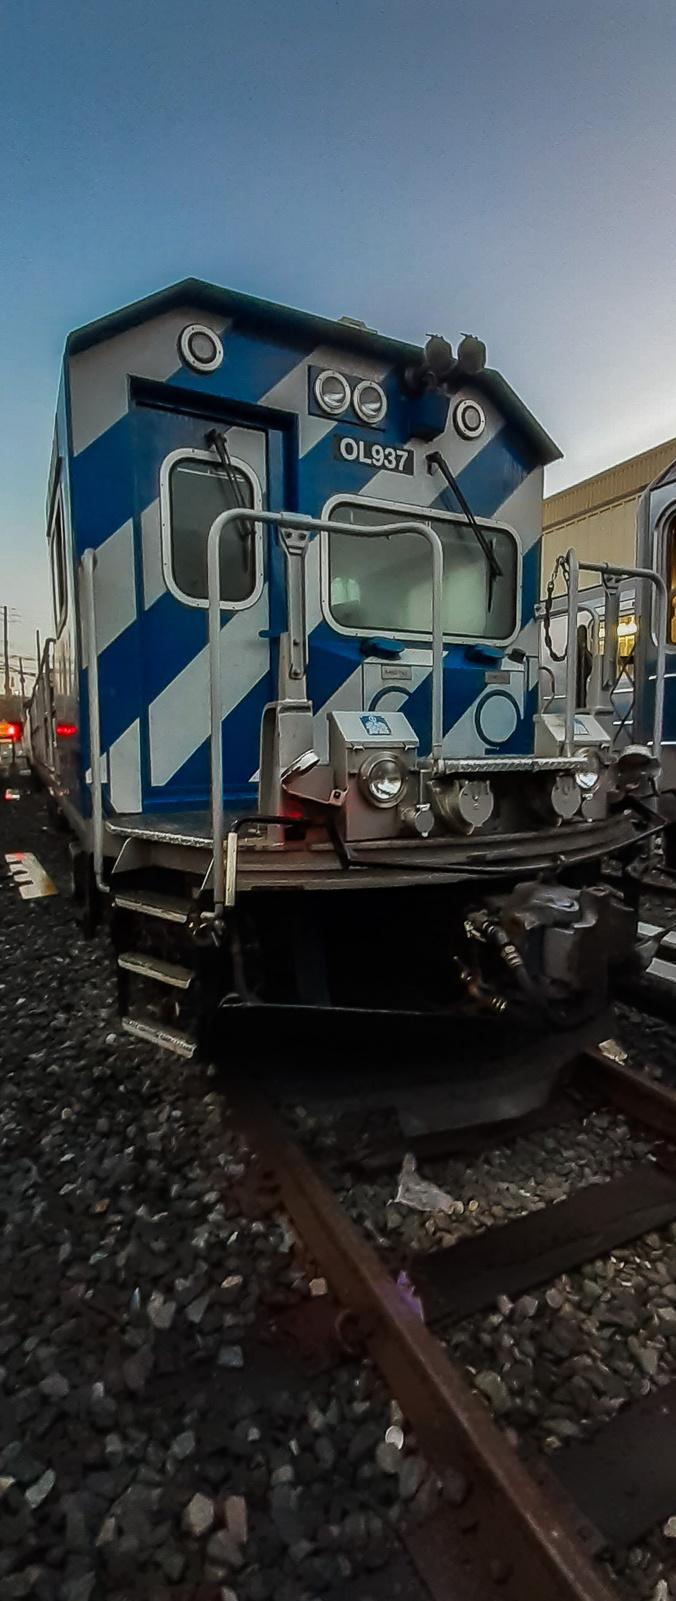 (381k, 1012x1044)<br><b>Country:</b> United States<br><b>City:</b> New York<br><b>System:</b> New York City Transit<br><b>Line:</b> BMT Myrtle Avenue Line<br><b>Location:</b> Bridge/Jay Street <br><b>Car:</b> BMT Elevated Gate Car 13xx <br><b>Photo by:</b> Joel Shanus<br><b>Viewed (this week/total):</b> 0 / 4144